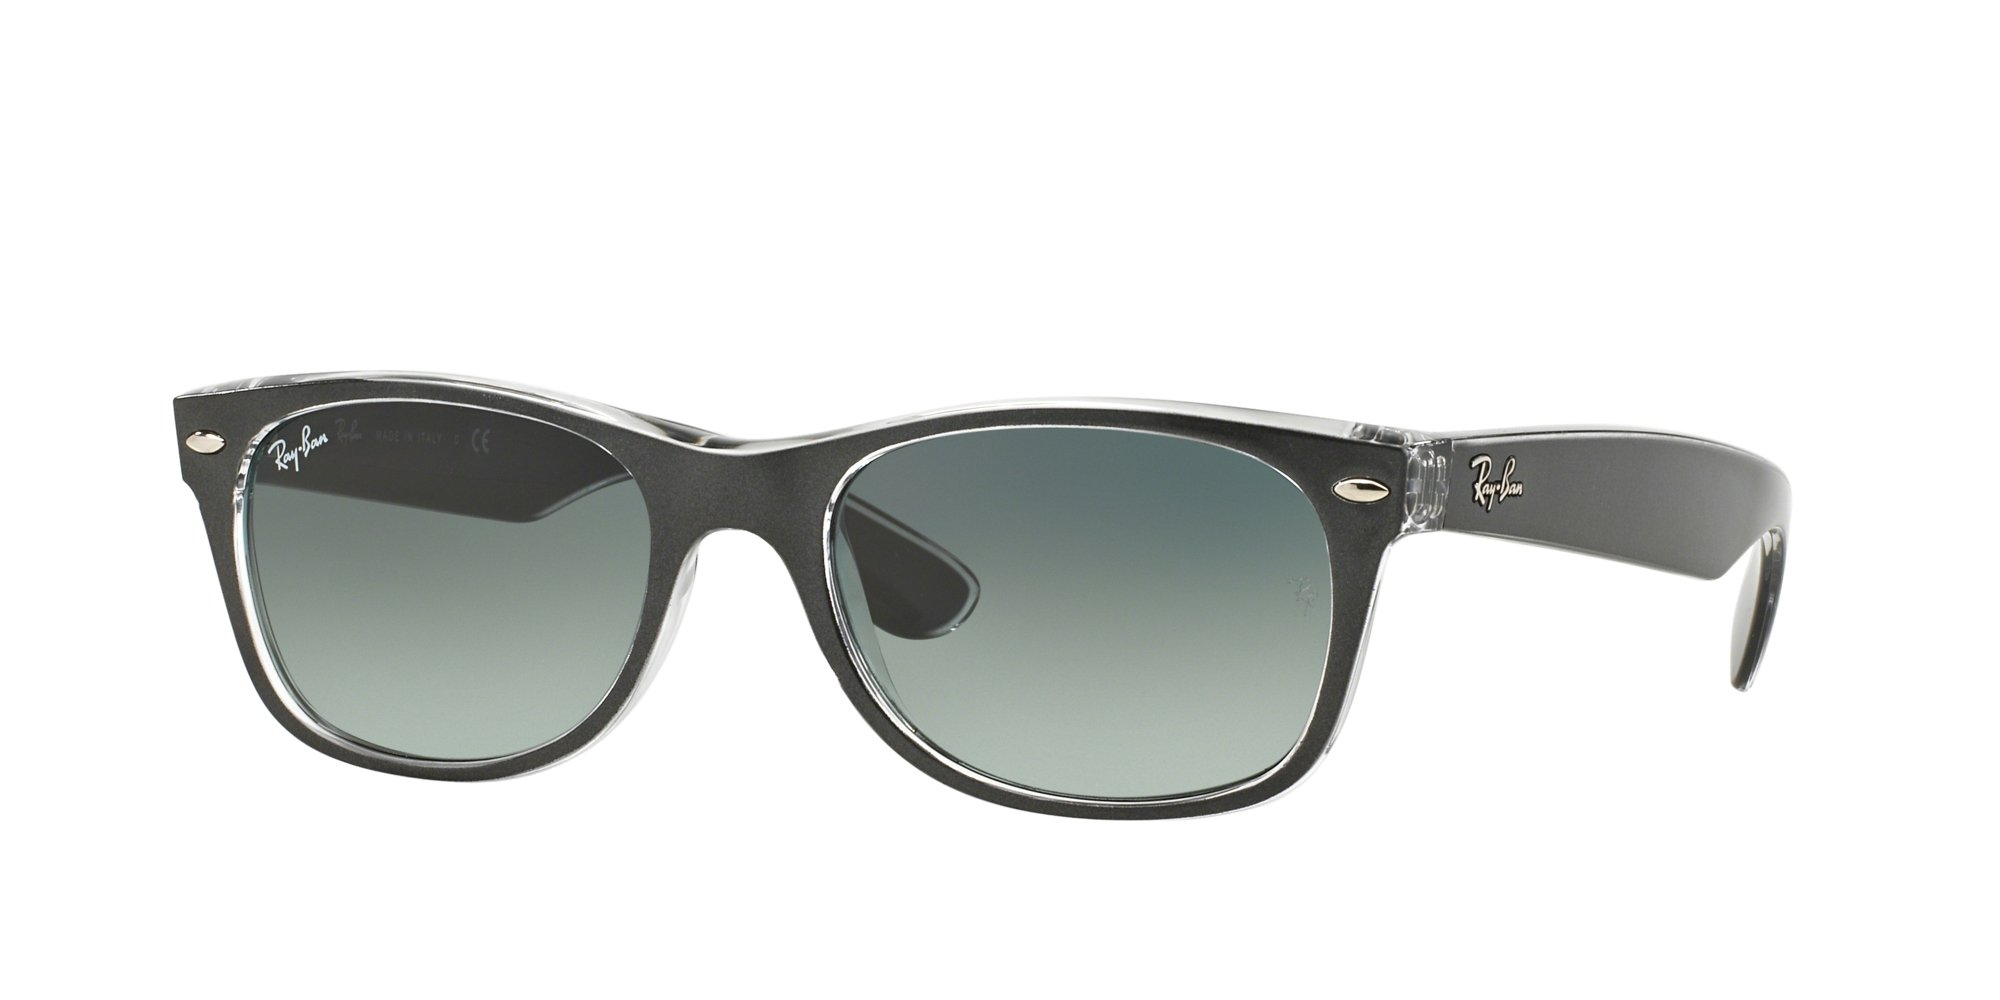 Ray Ban RB2132 NEW WAYFARER 614371 55M Brushed Gunmetal On Transp/Grey Gradient Dark Grey Sunglasses For Men For Women